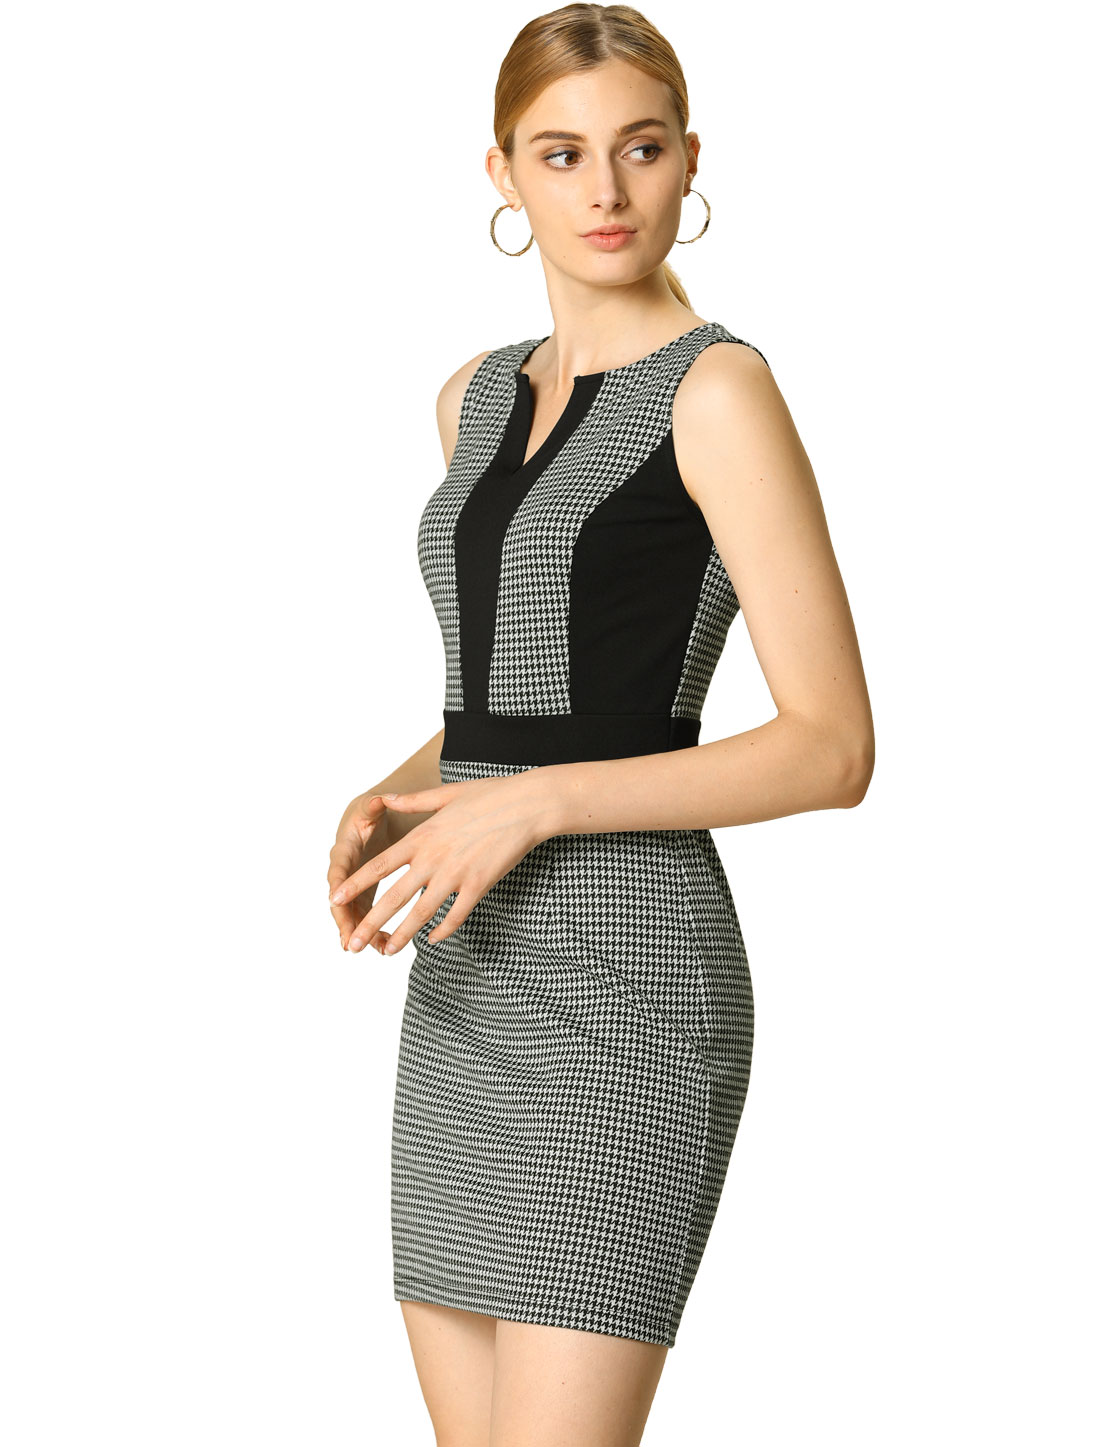 Allegra K Women's Sleeveless Houndstooth Business Dress Black/White XL